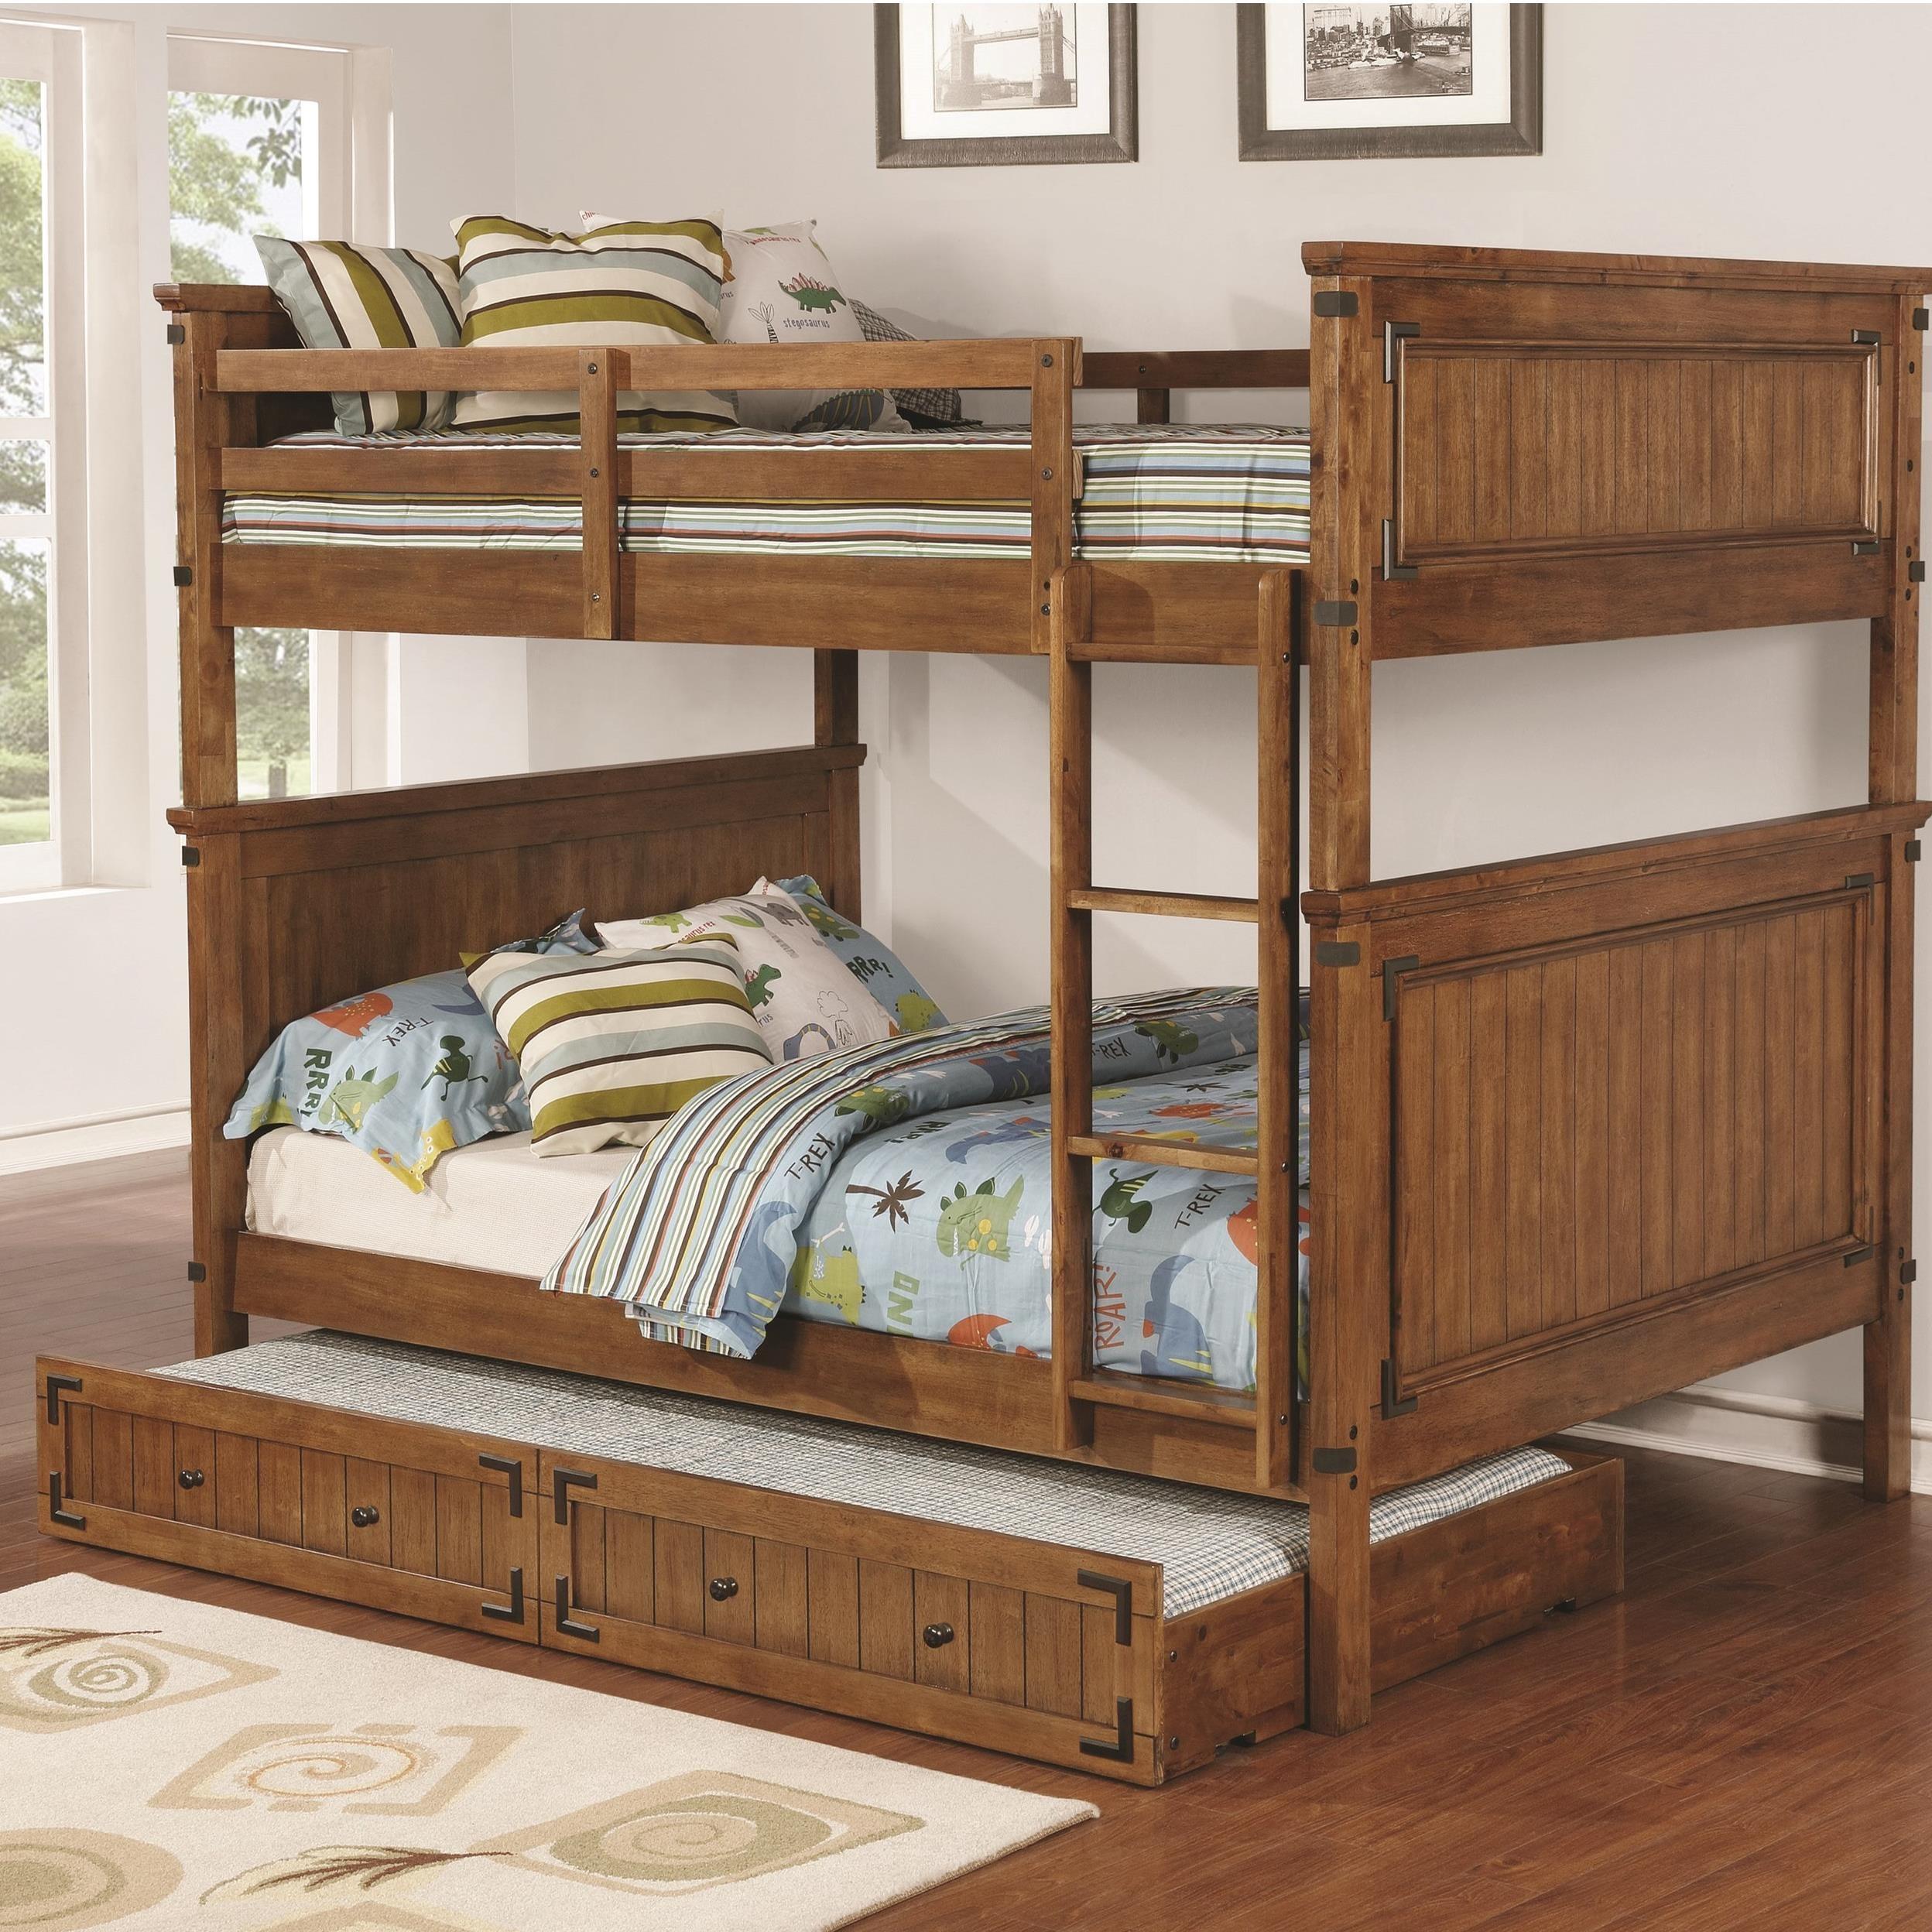 Coaster Coronado Bunk Bed Casual Wooden Full over Full